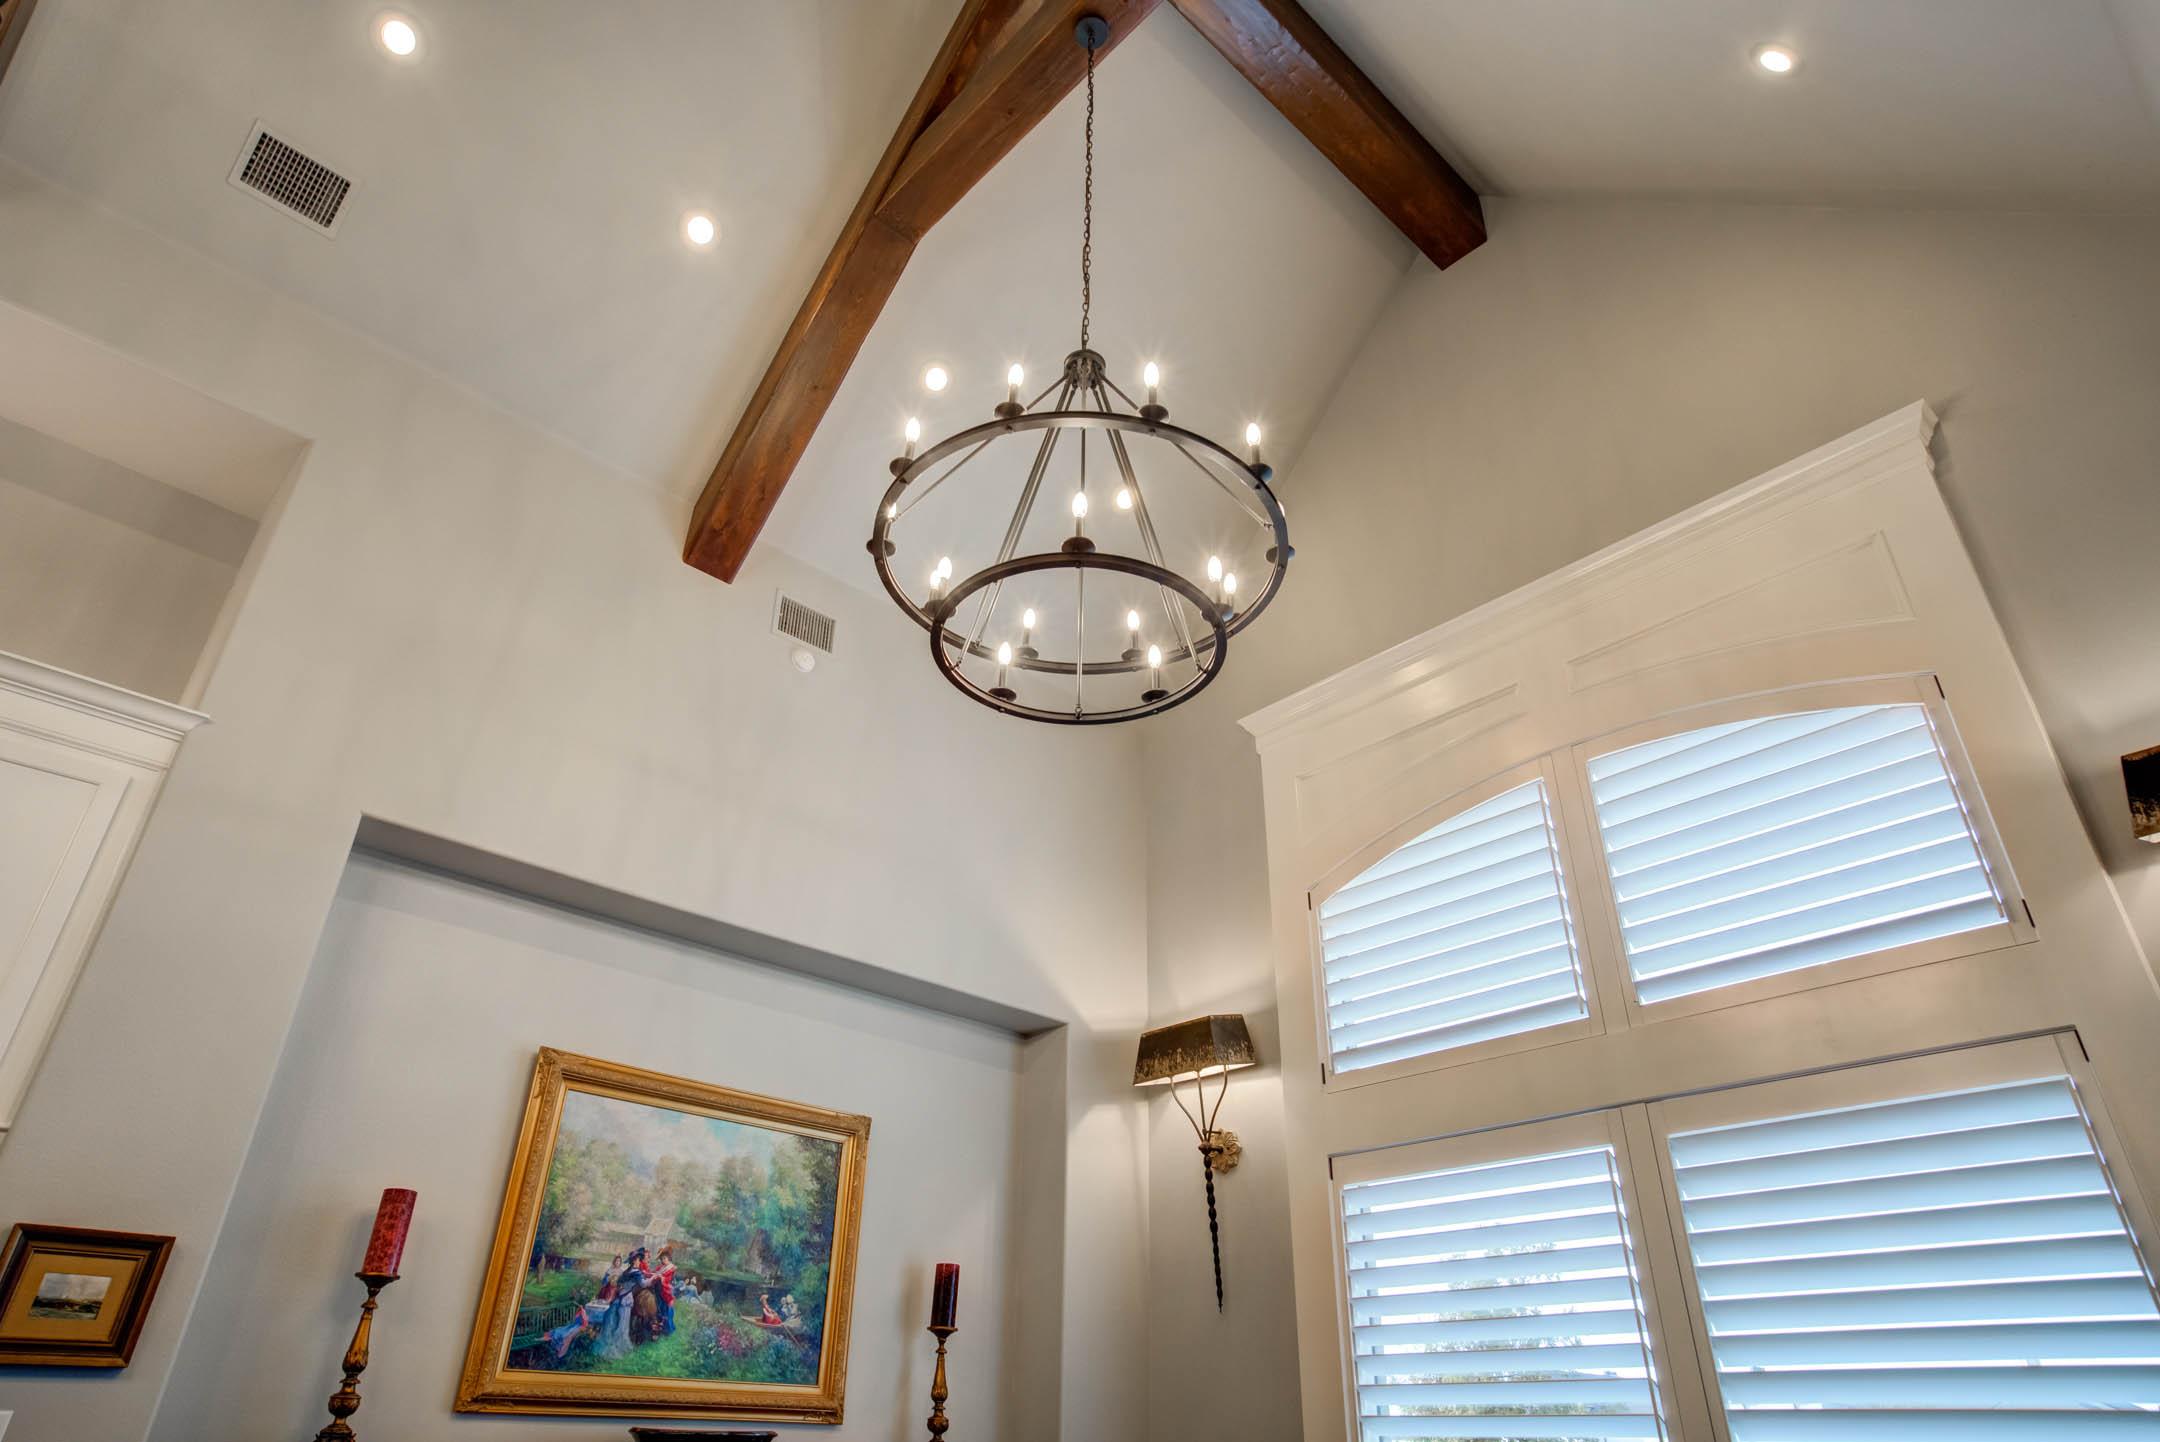 Vaulted ceiling in dining room of custom home in Lubbock, Texas.